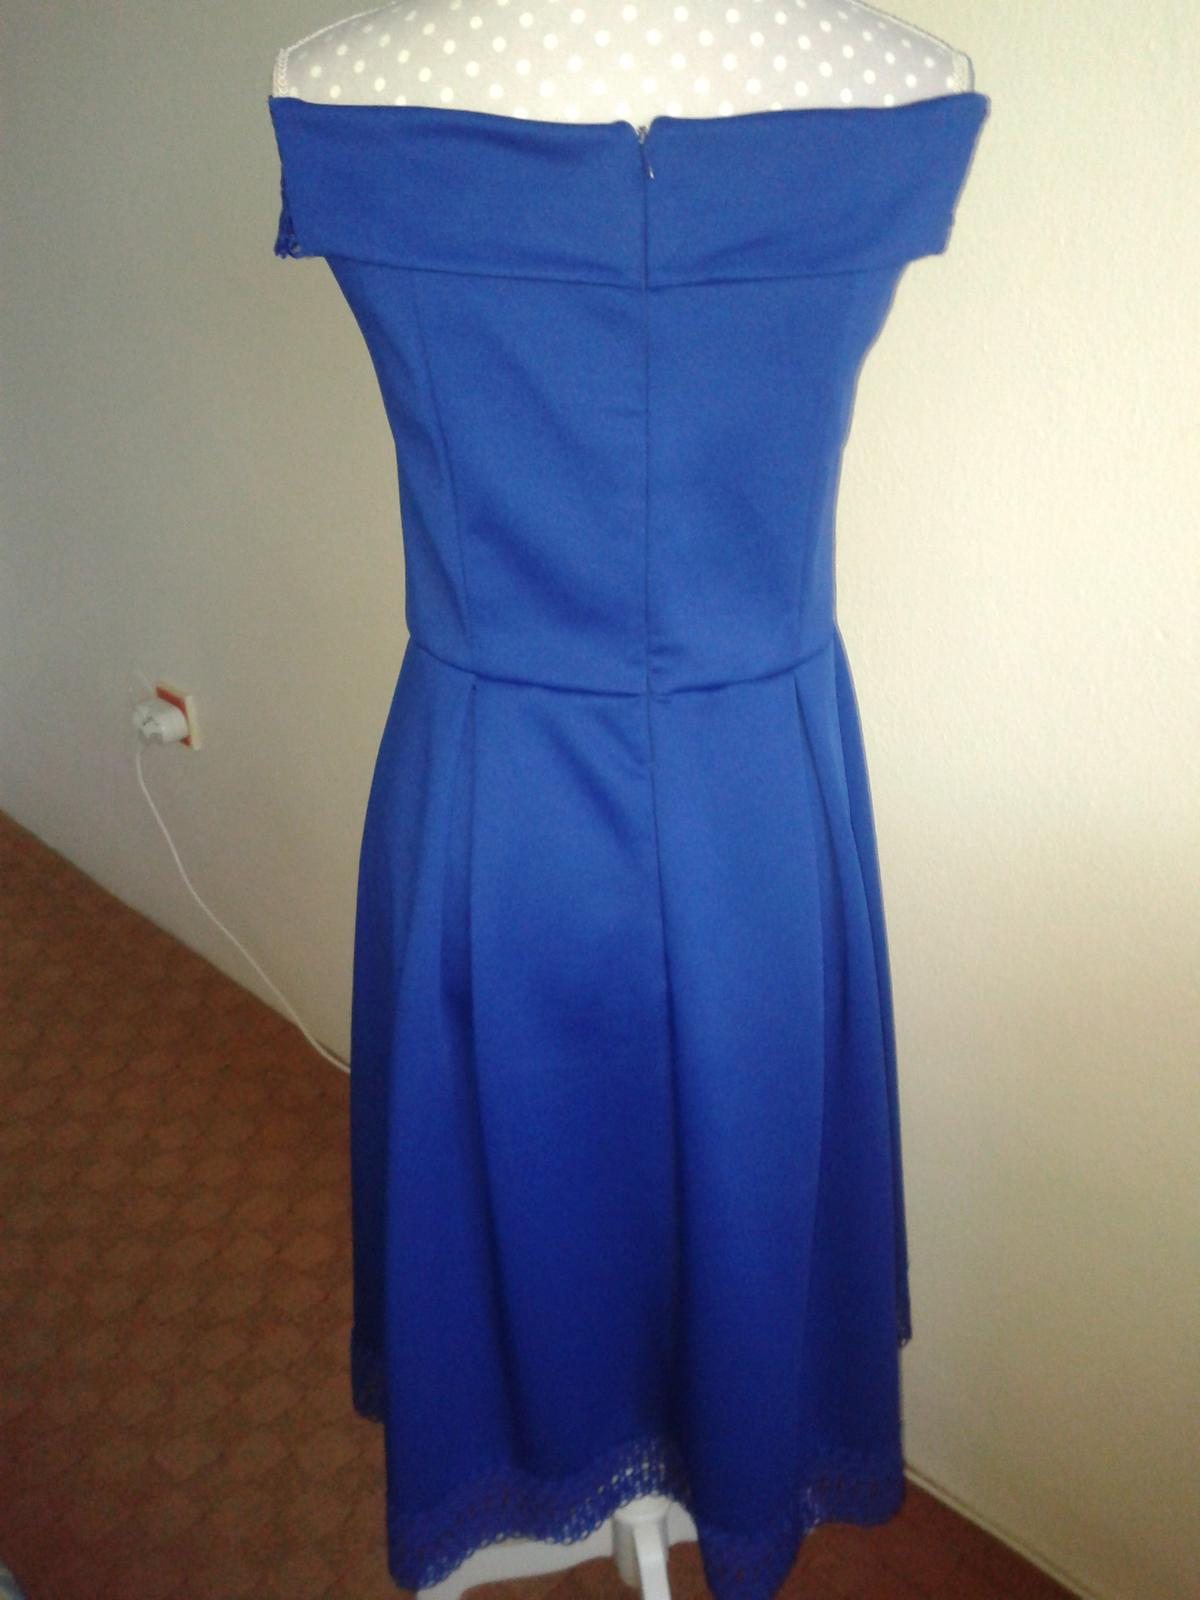 jasnomodré šaty cez ramená Dorothy Perkins veľ. L/42 - Obrázok č. 2